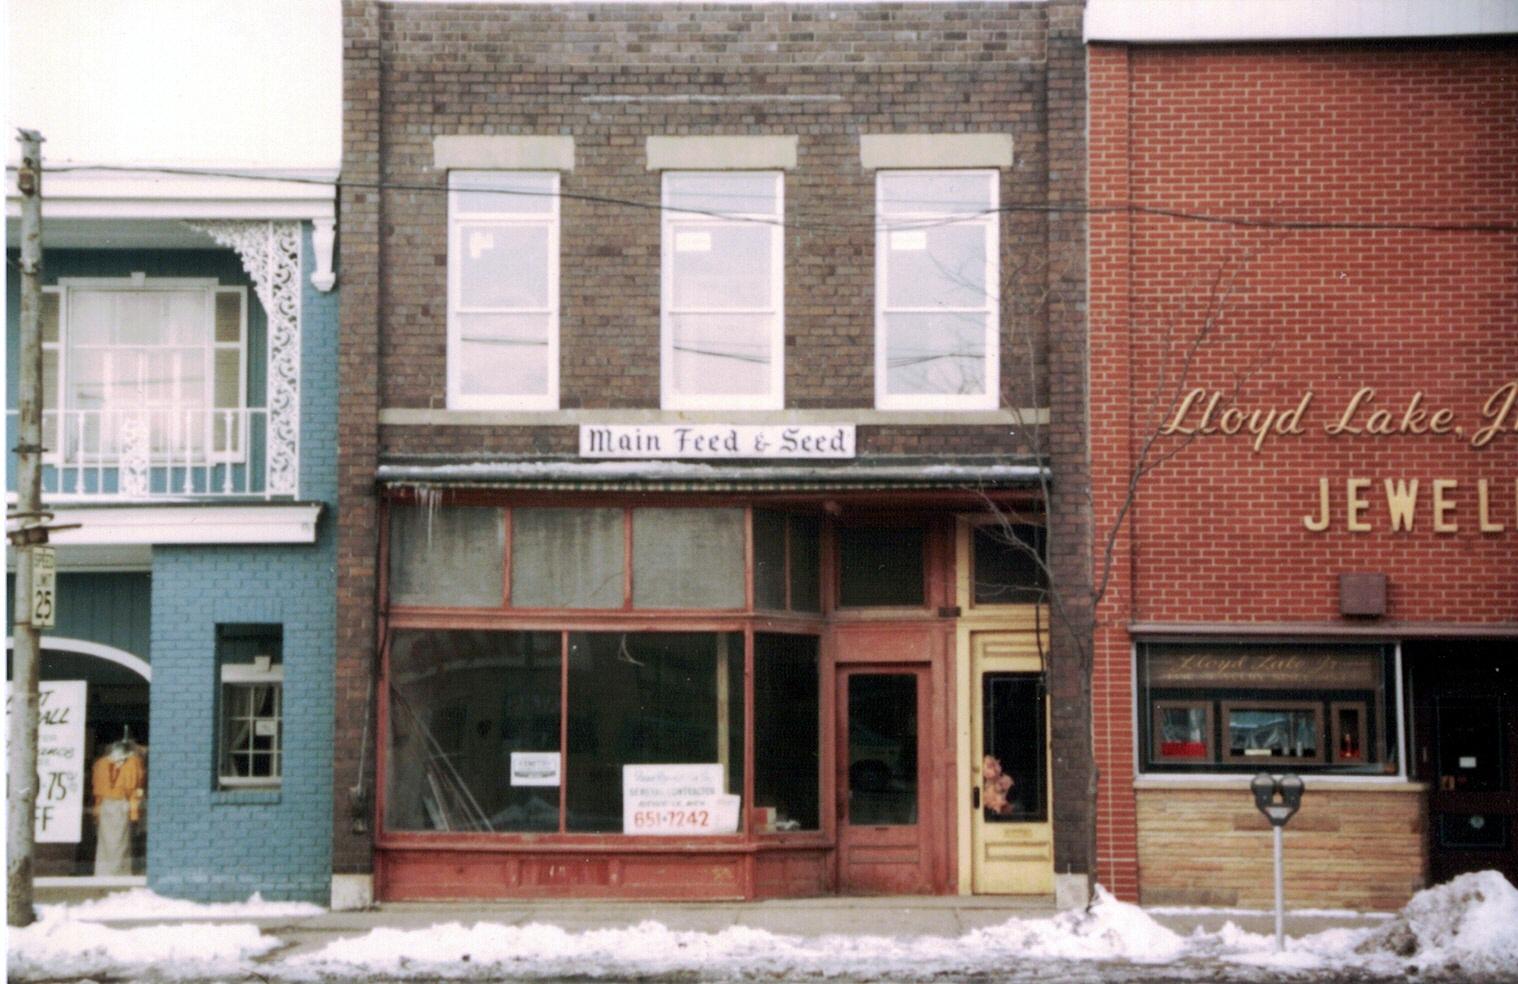 Lewis Ward Curtis Building, east elevation, 1982